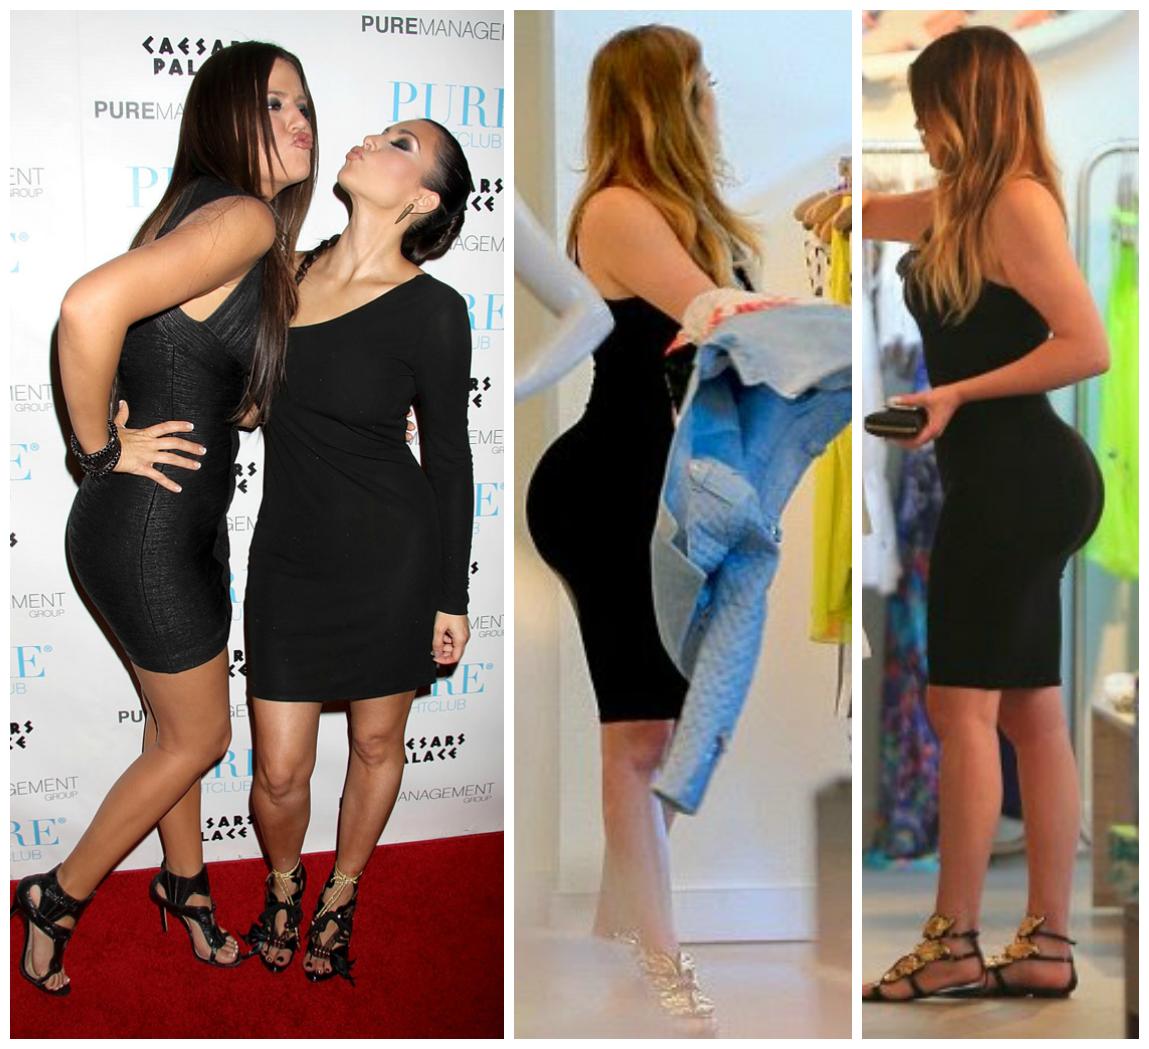 Khloe Kardashian Tits - Ass Liking Gallery